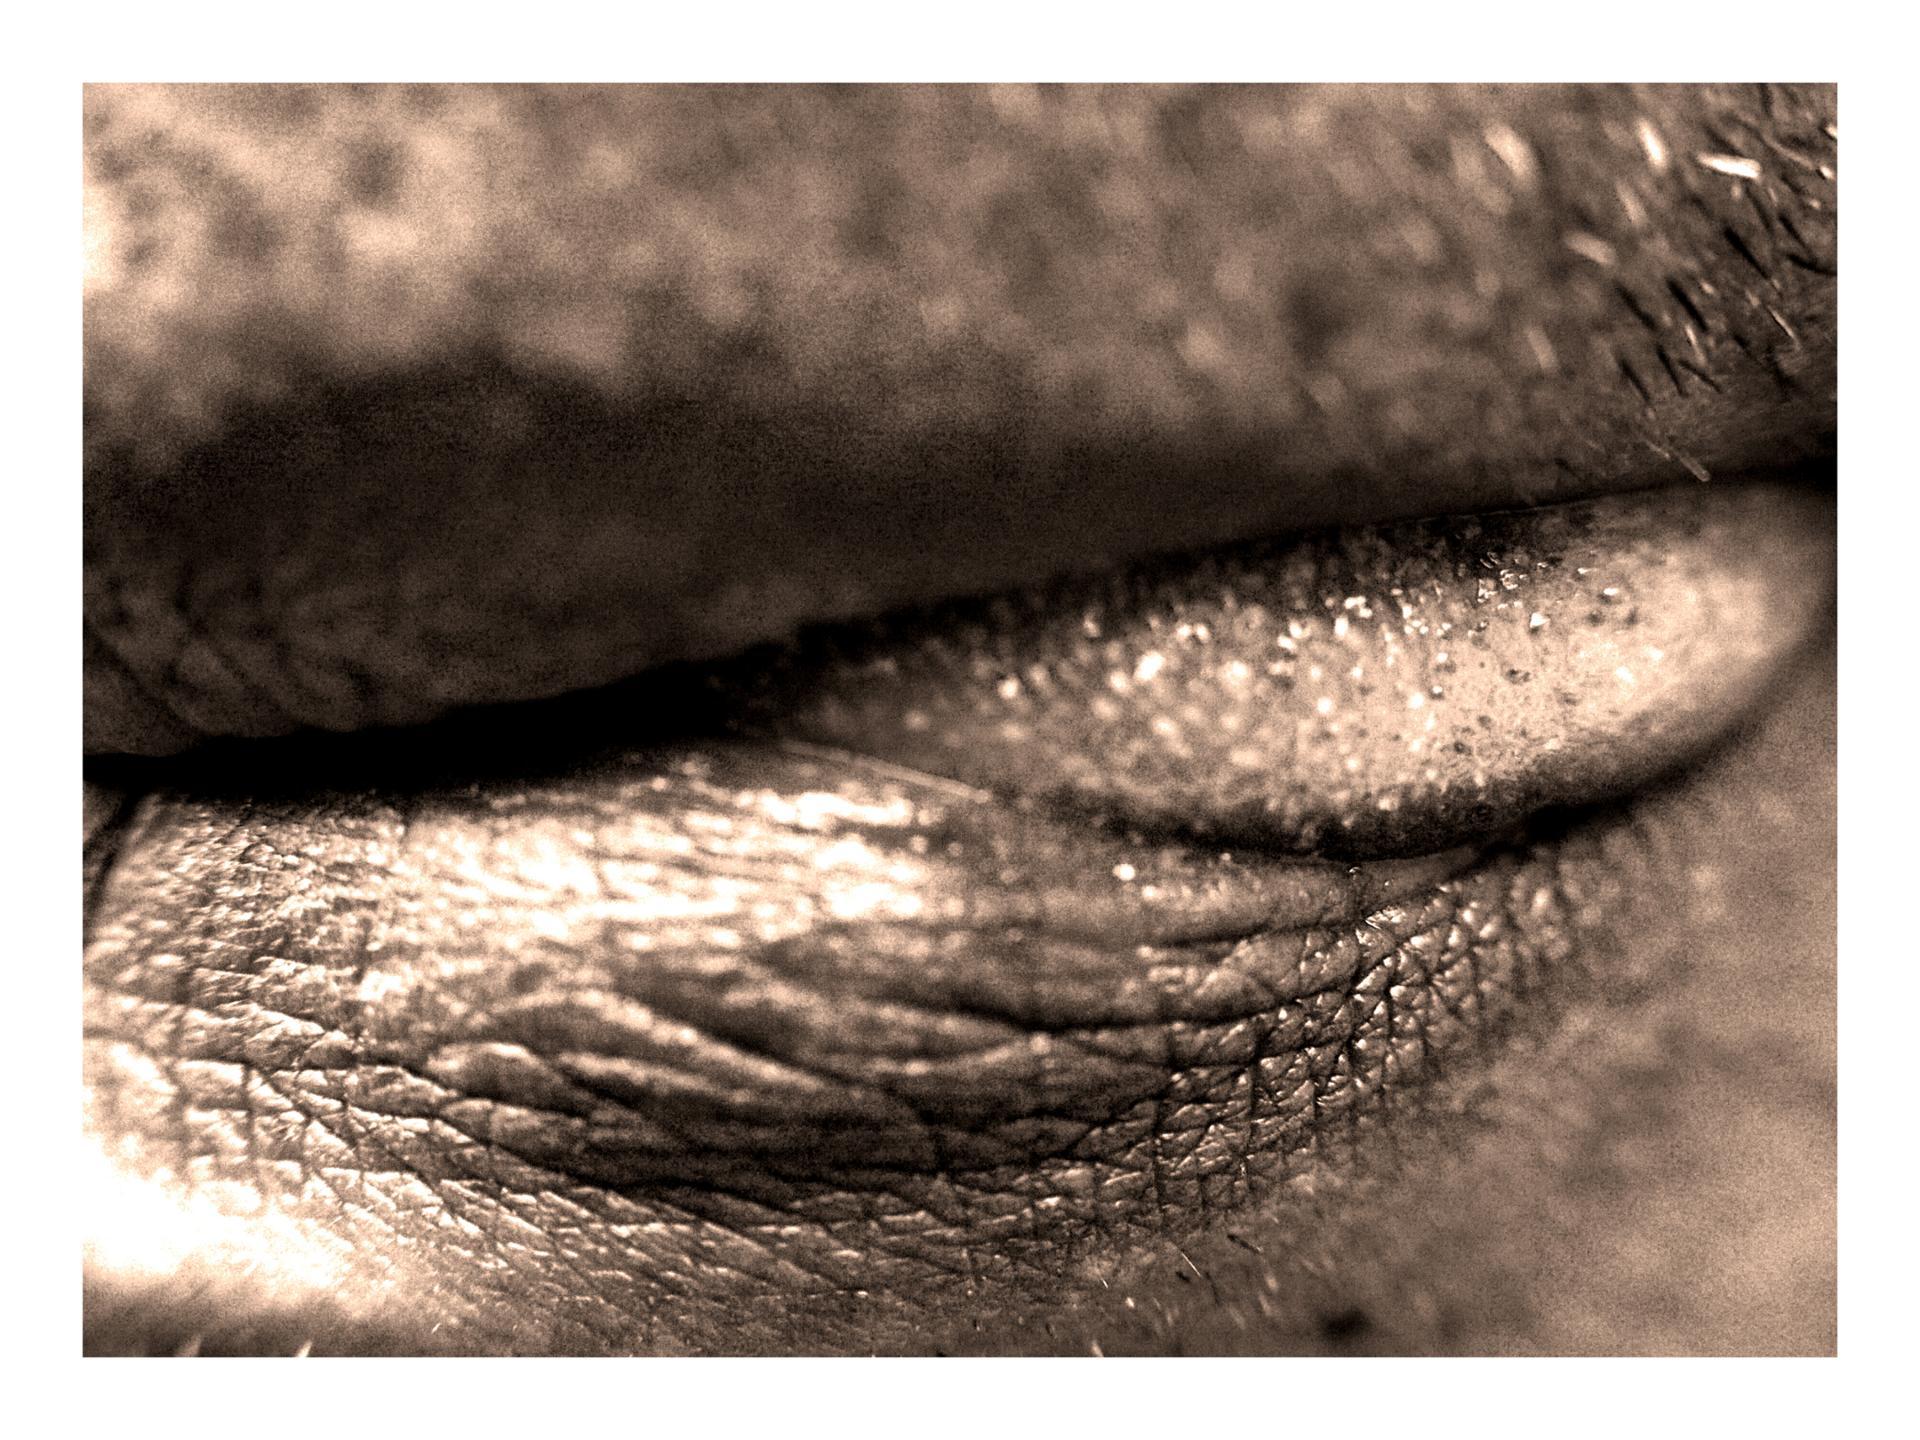 Lipsss